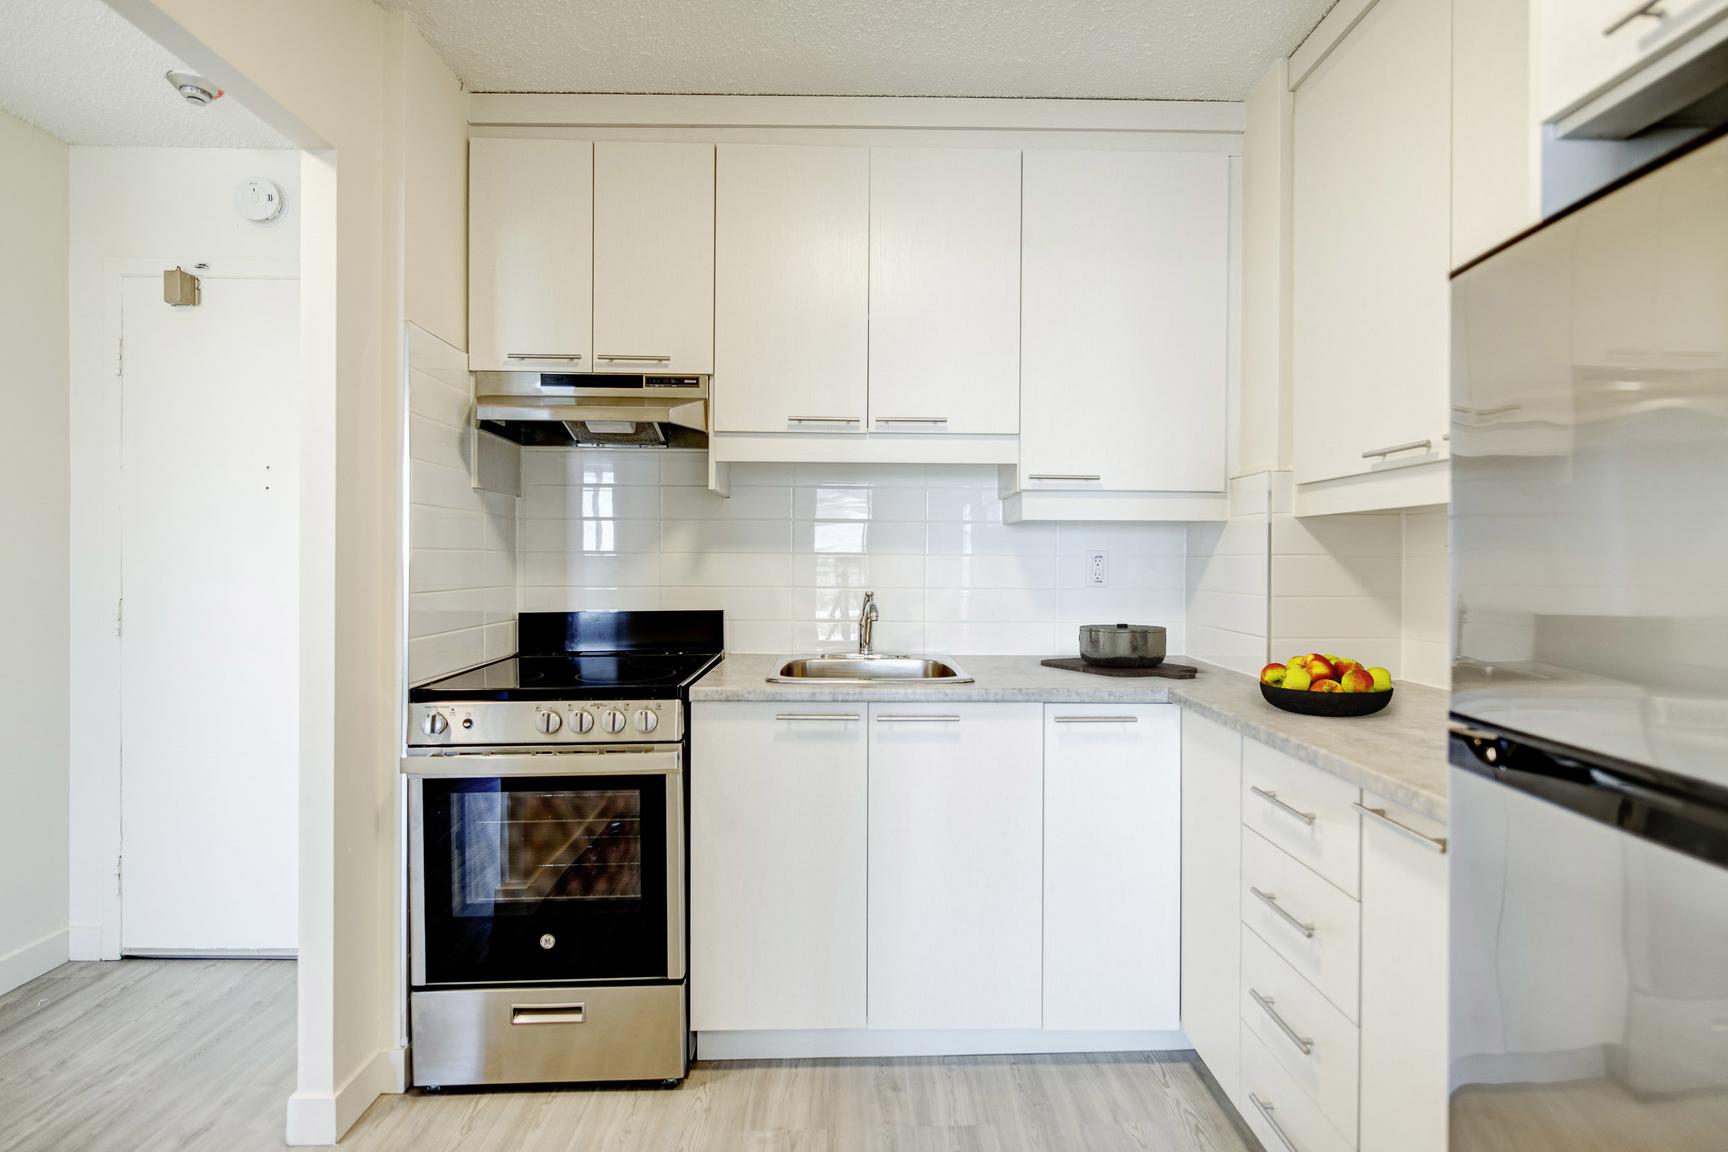 1 bedroom Apartments for rent in Laval at Le Quatre Cent - Photo 03 - RentersPages – L407184